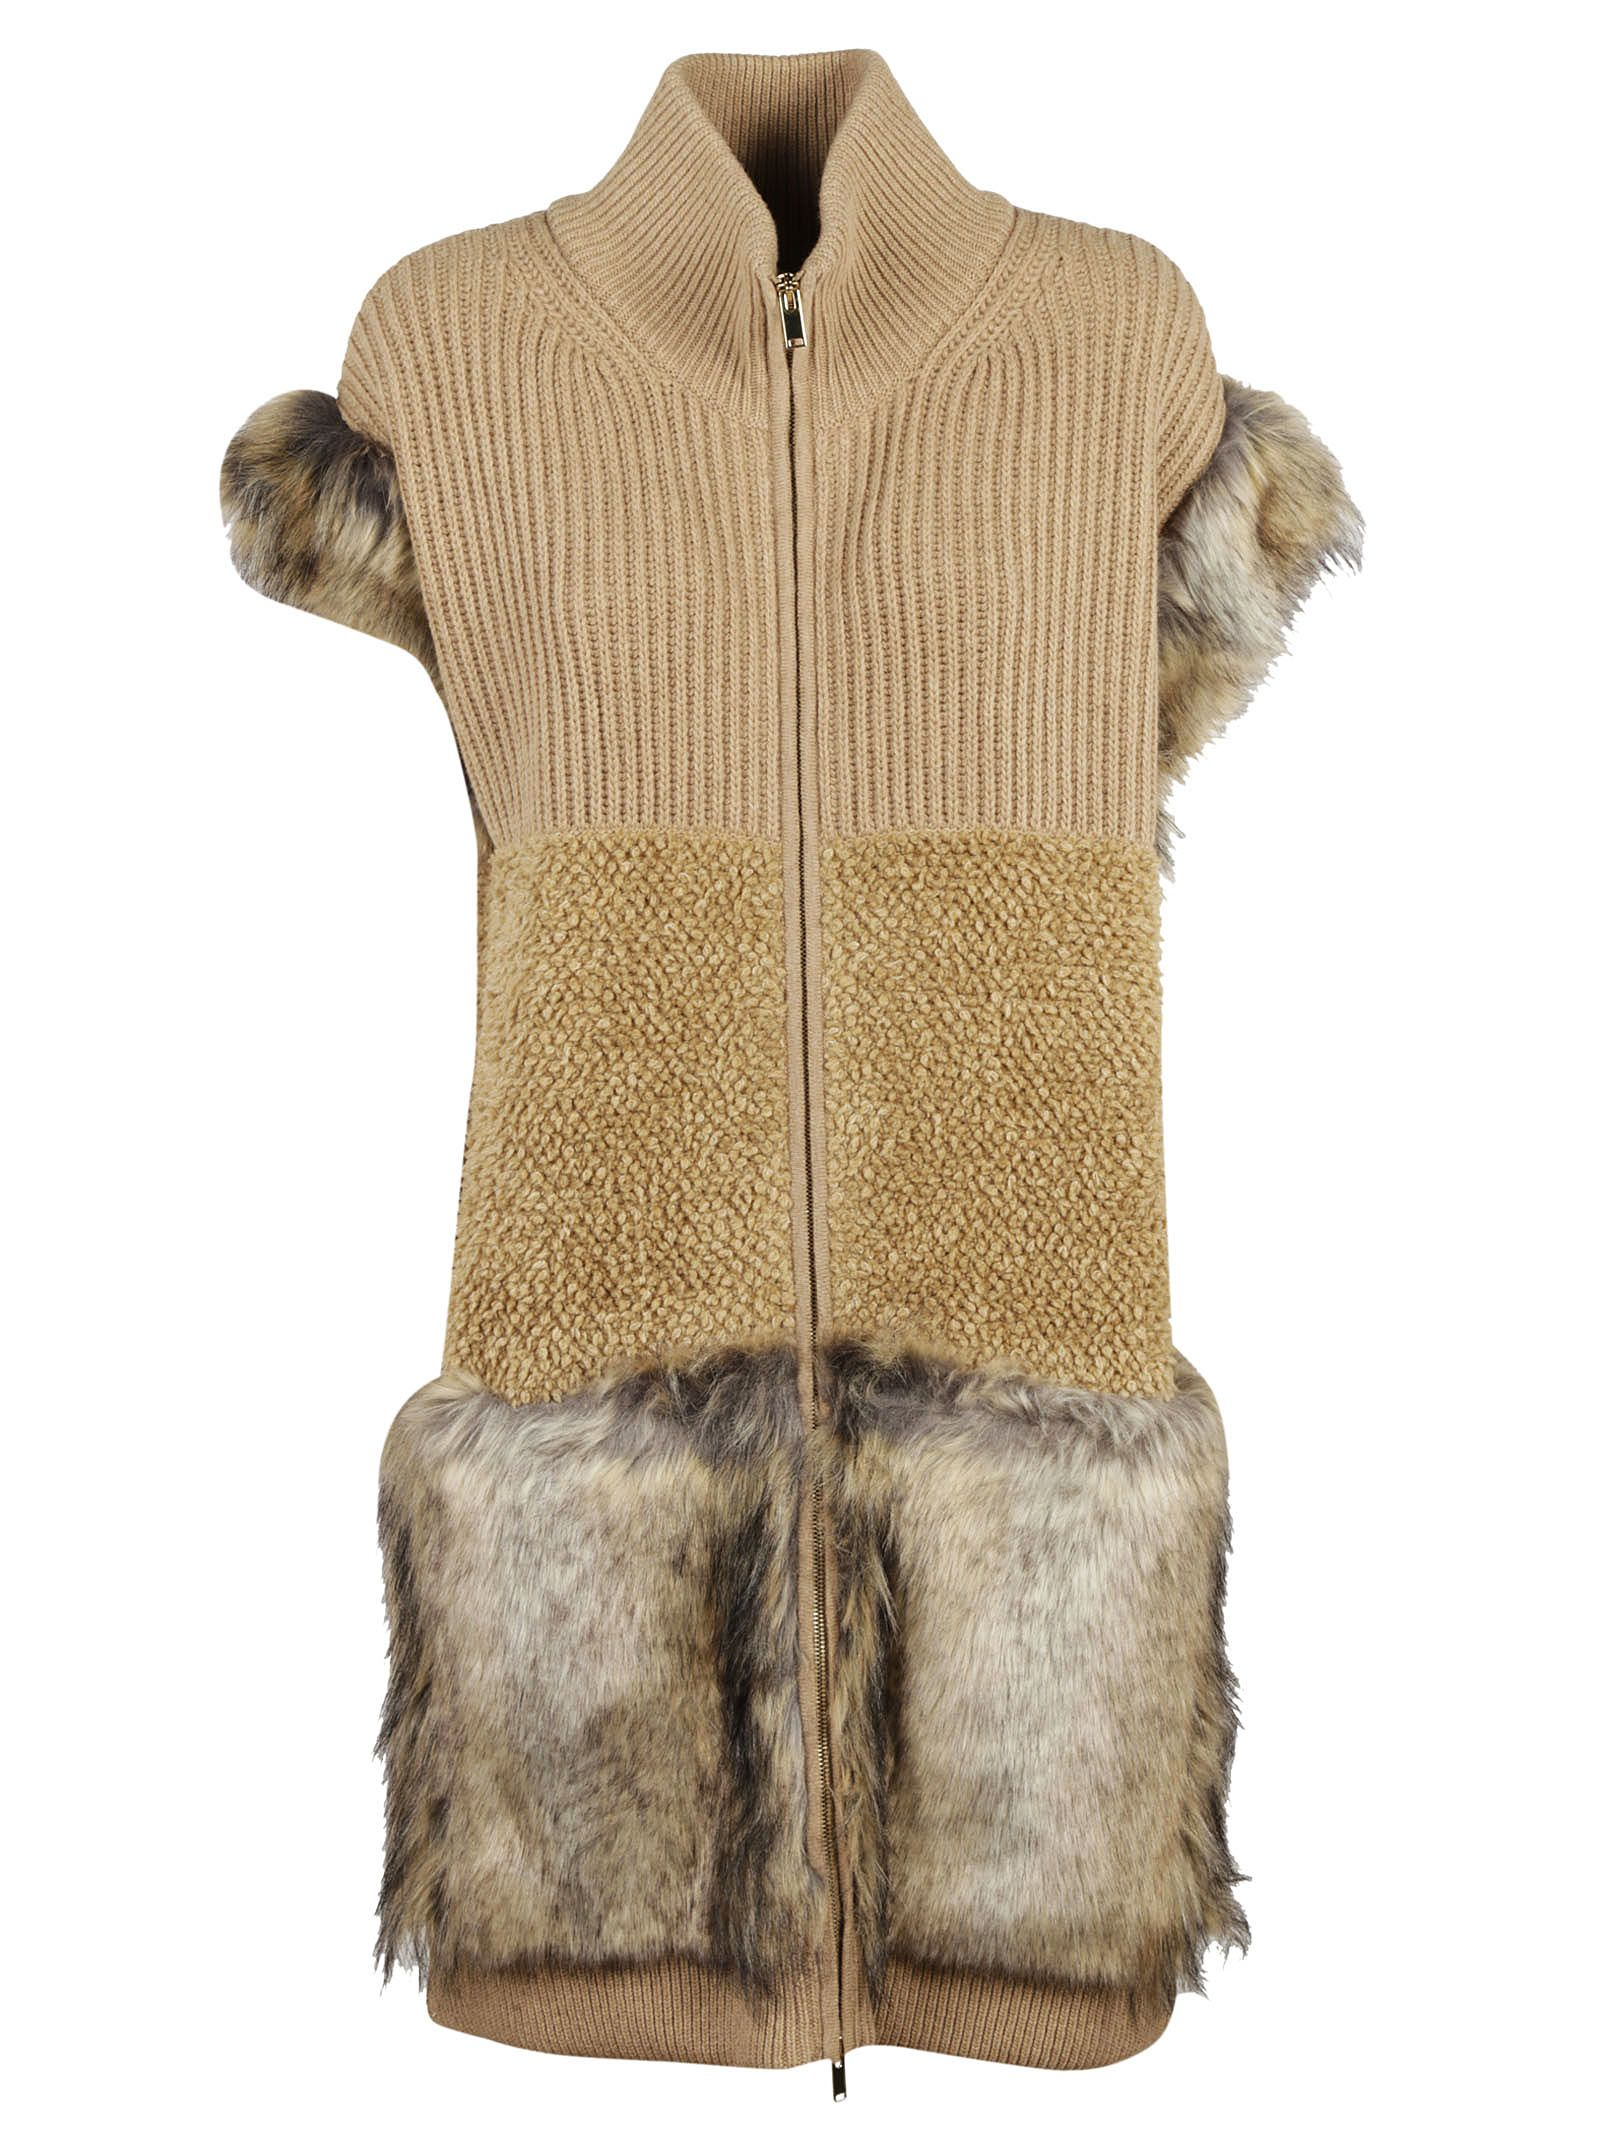 Stella McCartney Fur Knit Vest